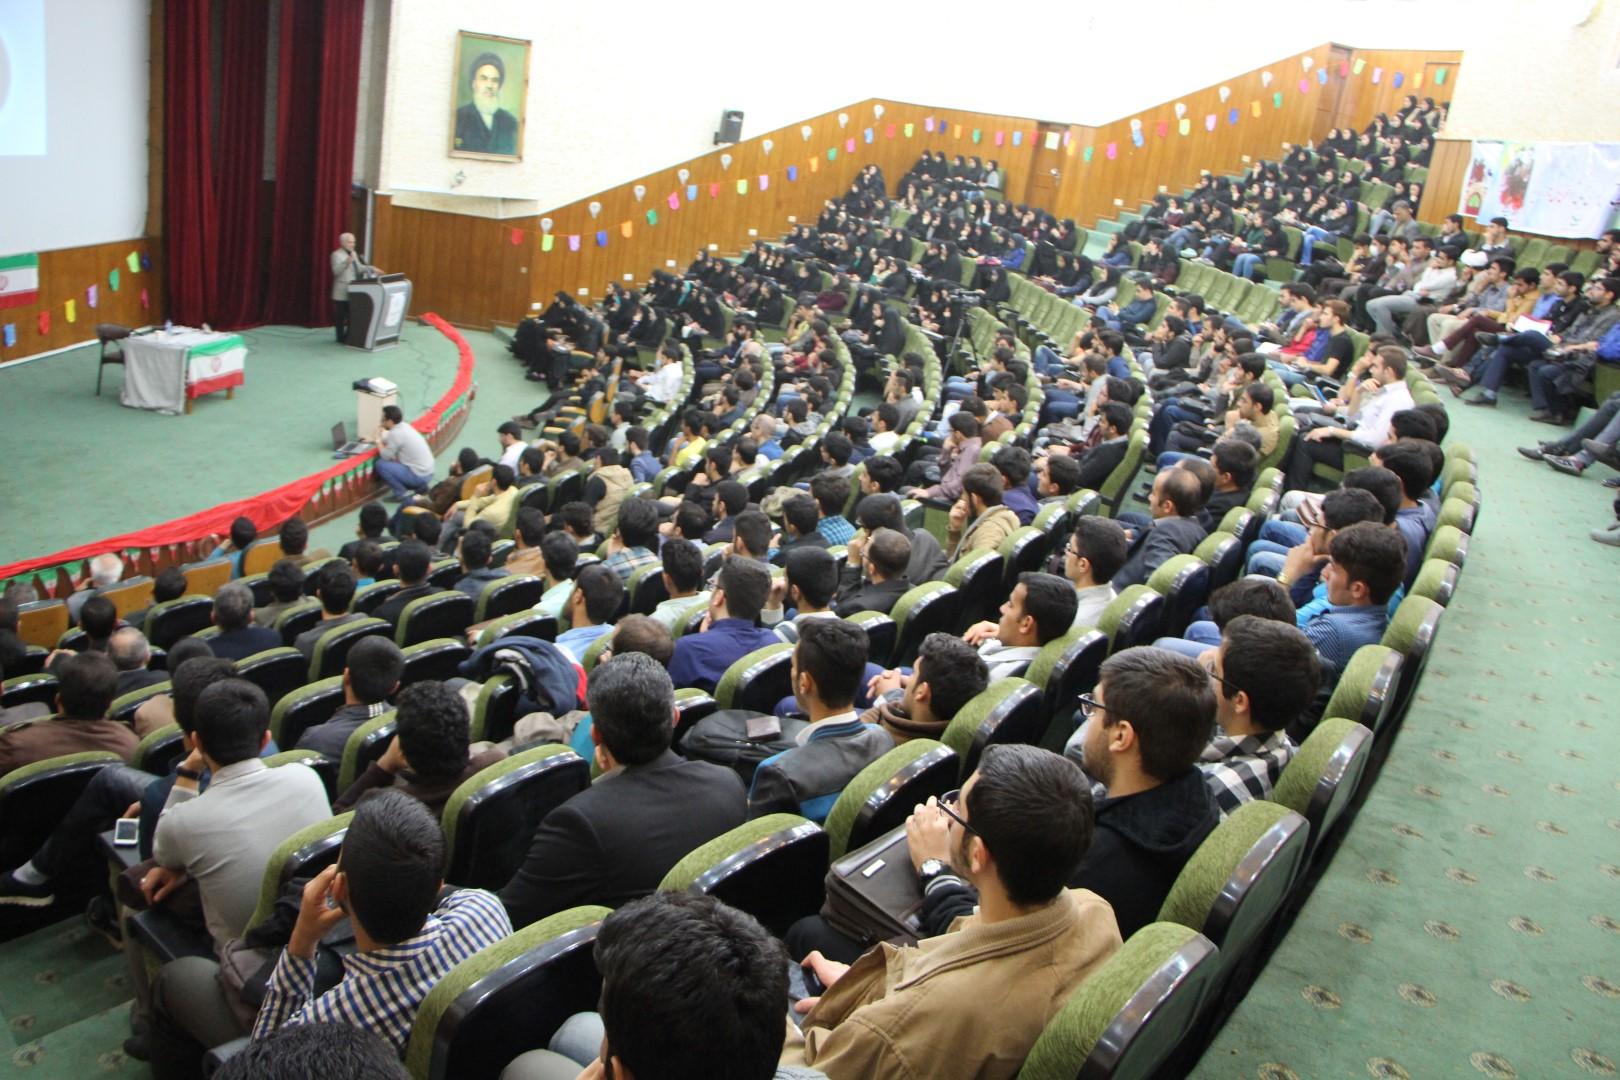 IMG 5195 گزارش تصویری؛ سخنرانی استاد حسن عباسی با موضوع از چوئن لای تا سیاست درهای باز